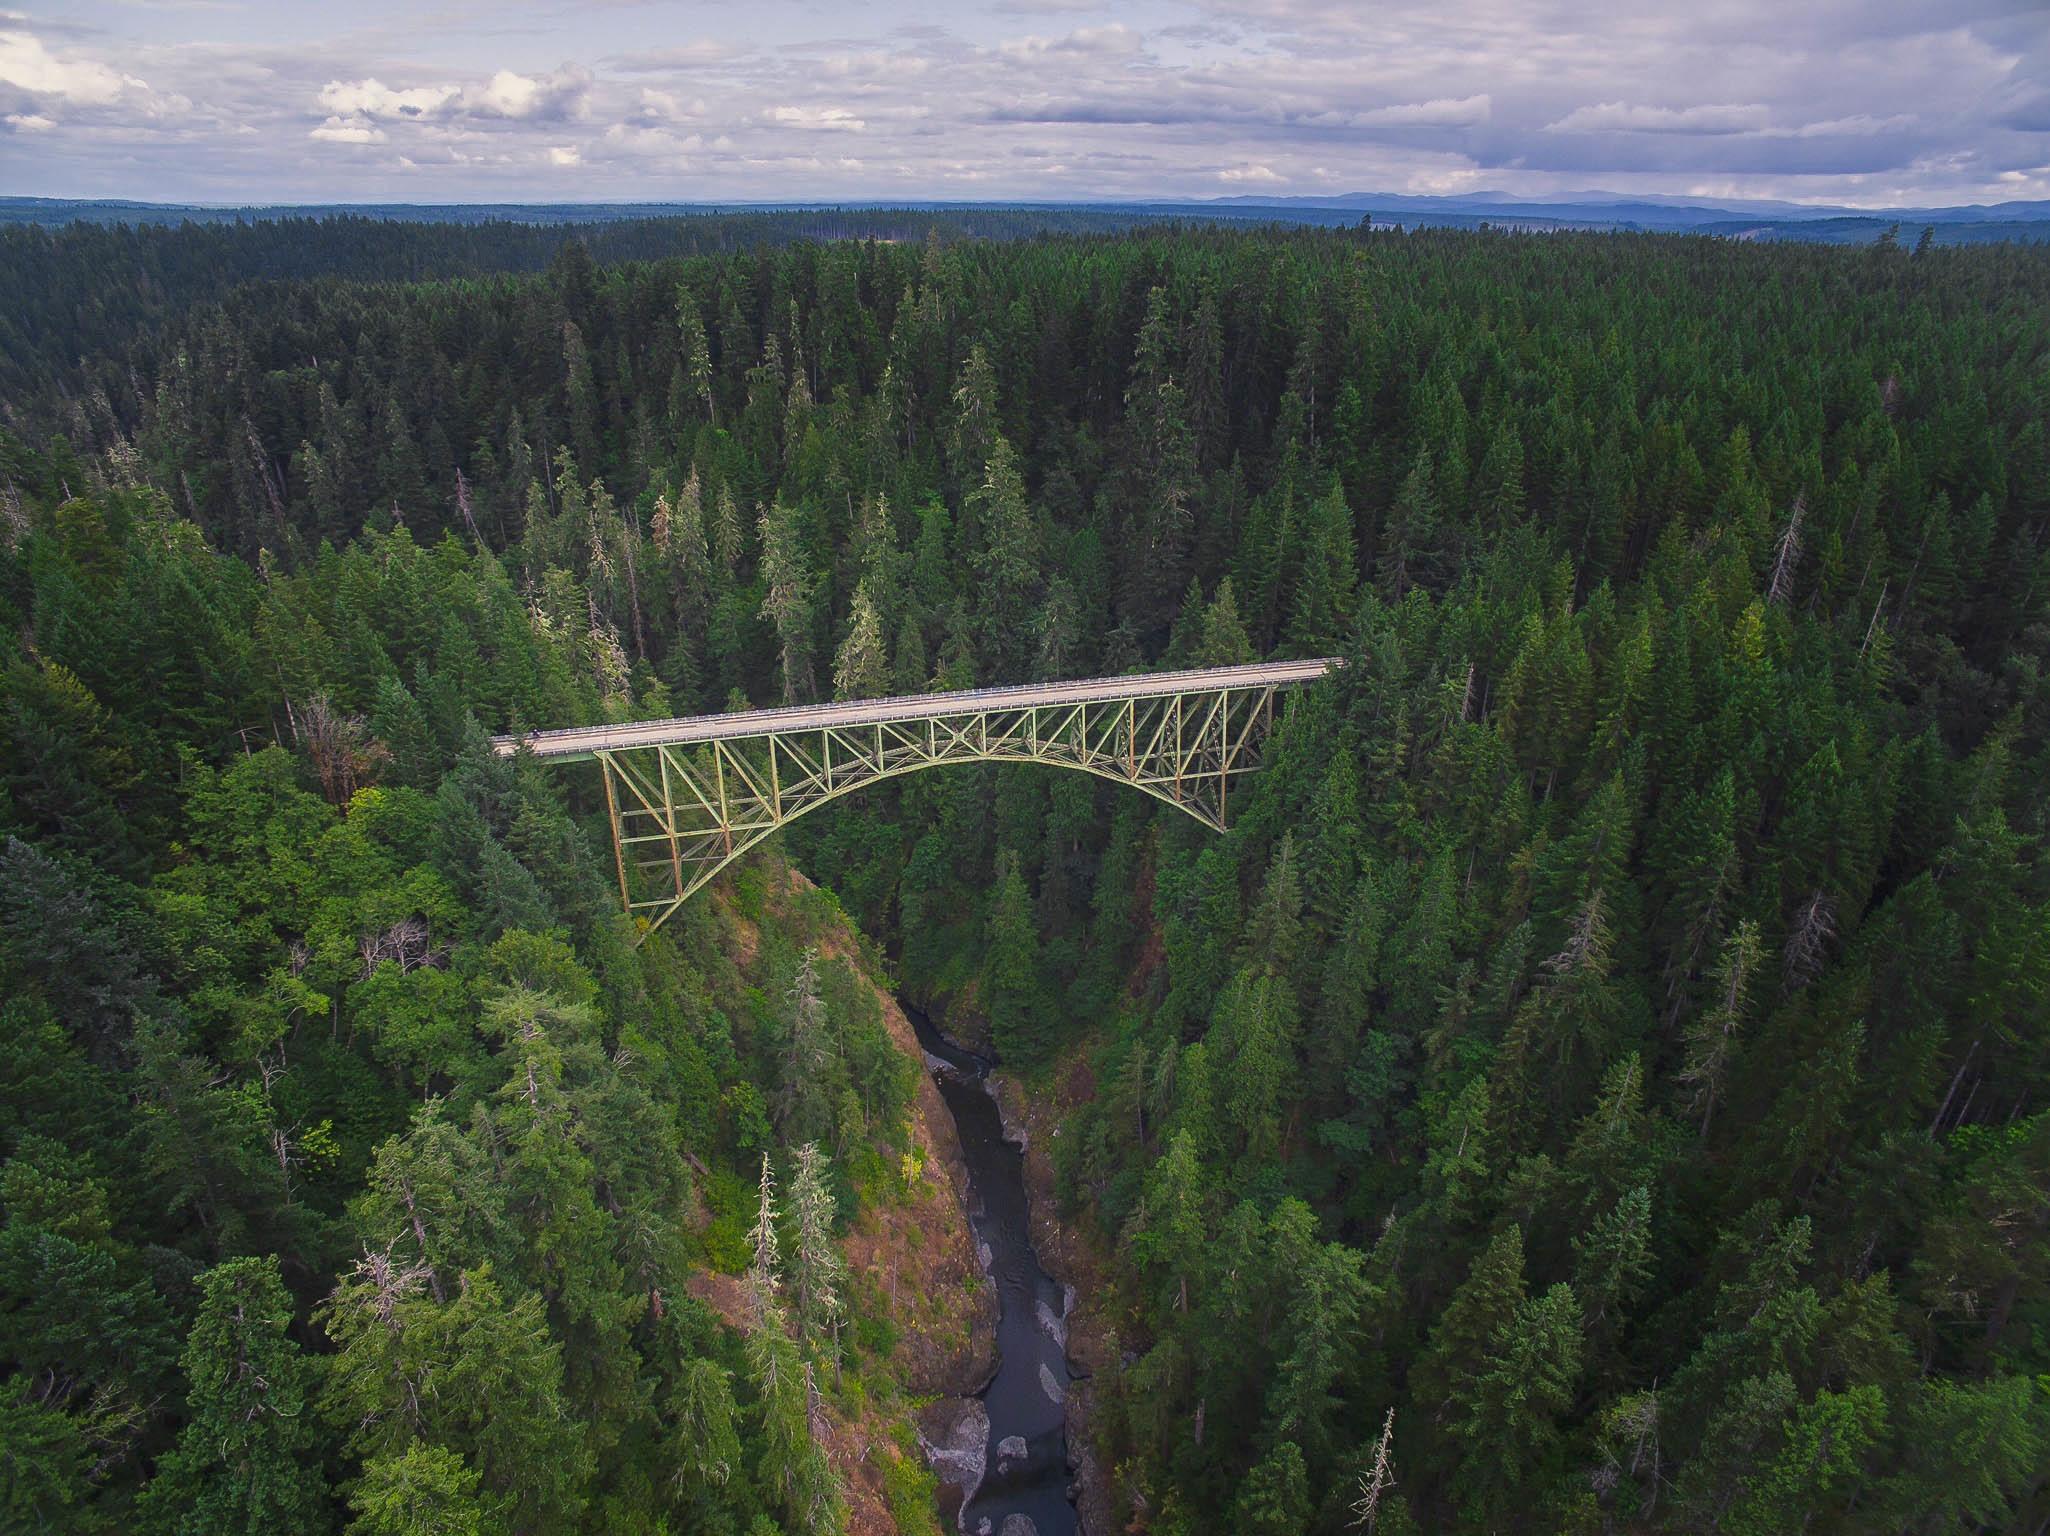 Arch bridge, bridge, forest, pine trees